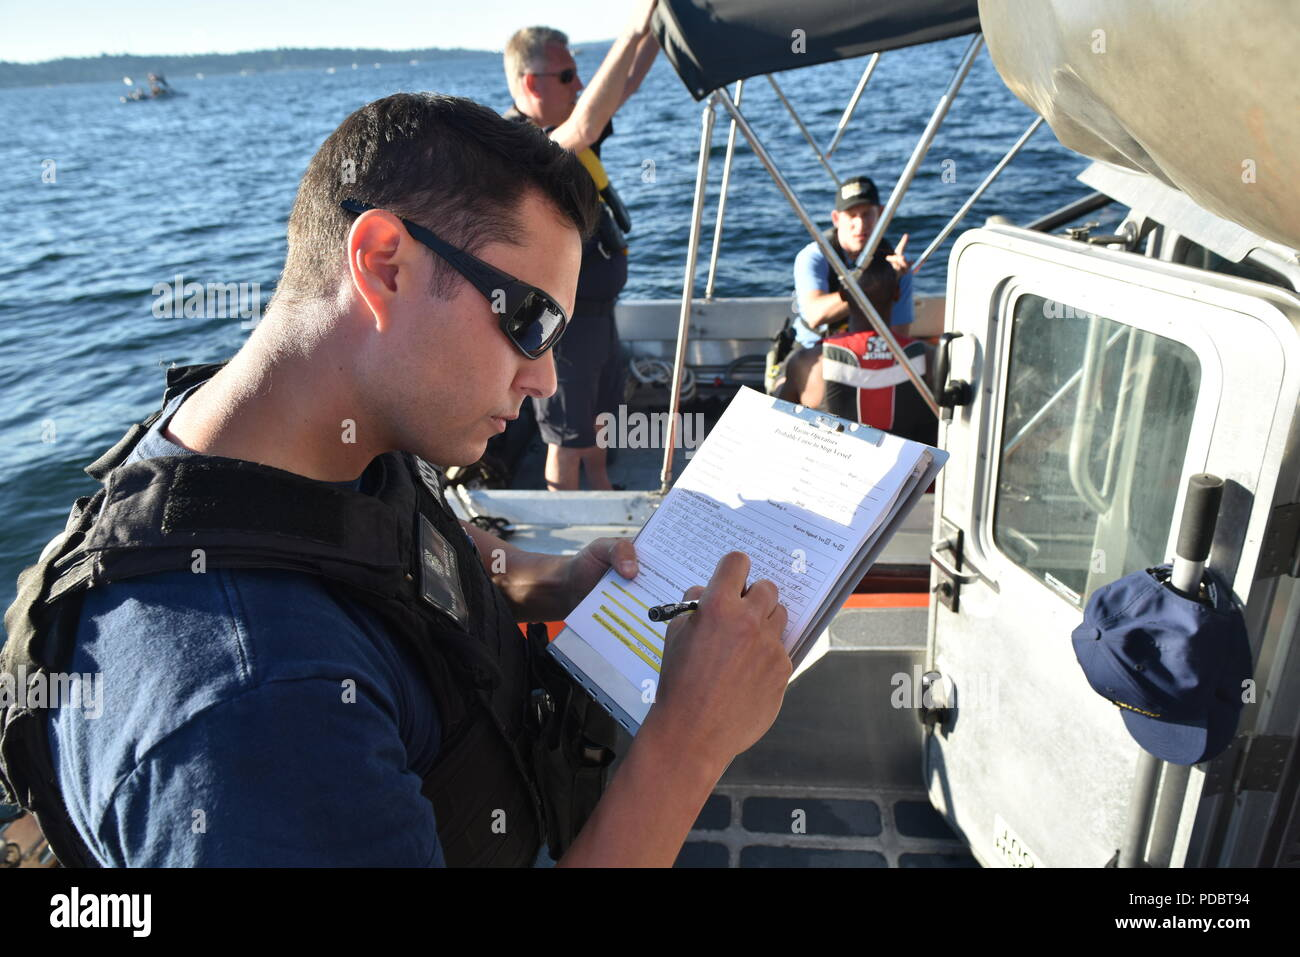 Coast Guard Petty Officer 2nd Class Mark Keightley, a boarding